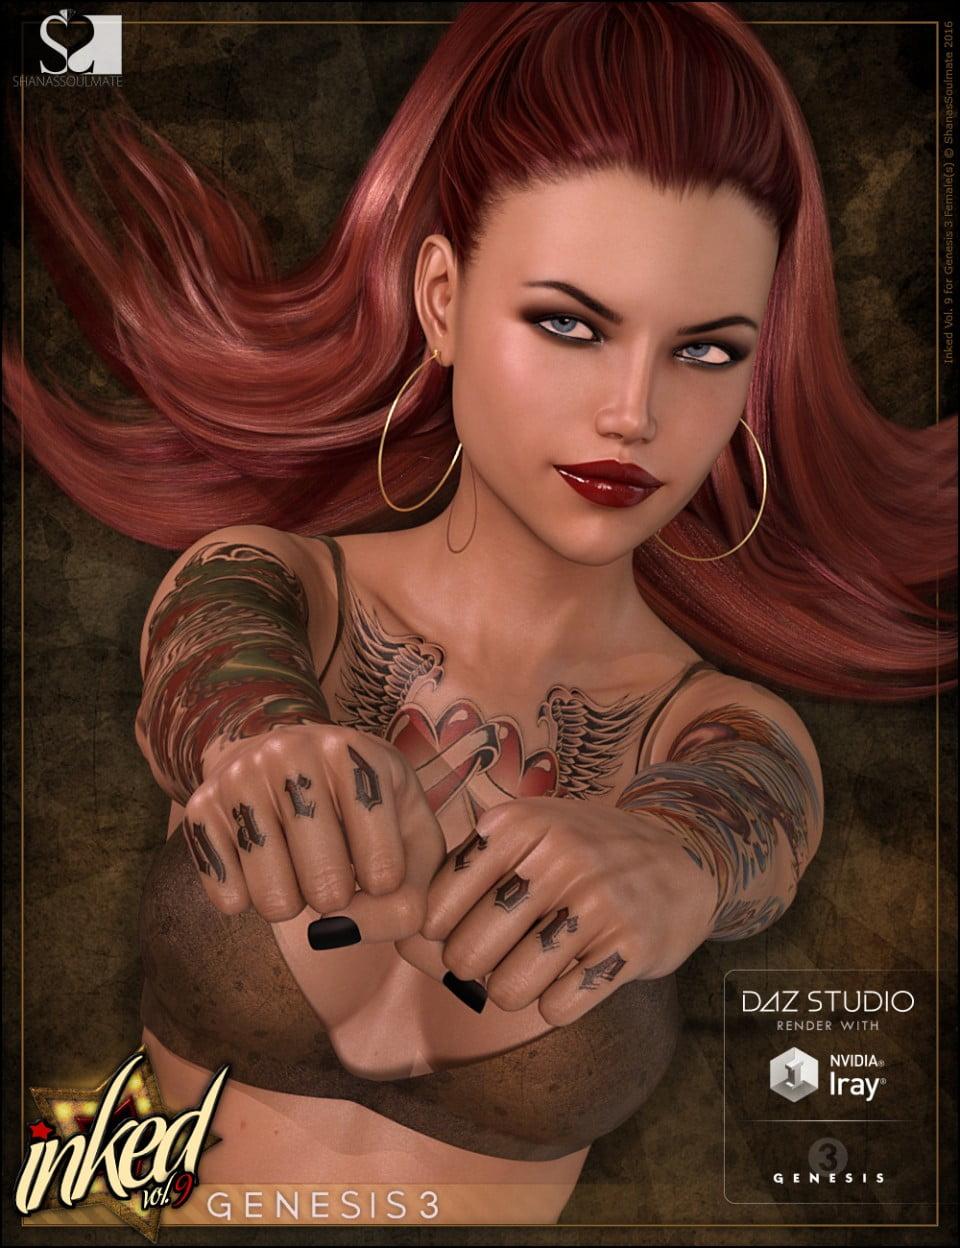 Inked Vol. 9 for Genesis 3 Female(s)